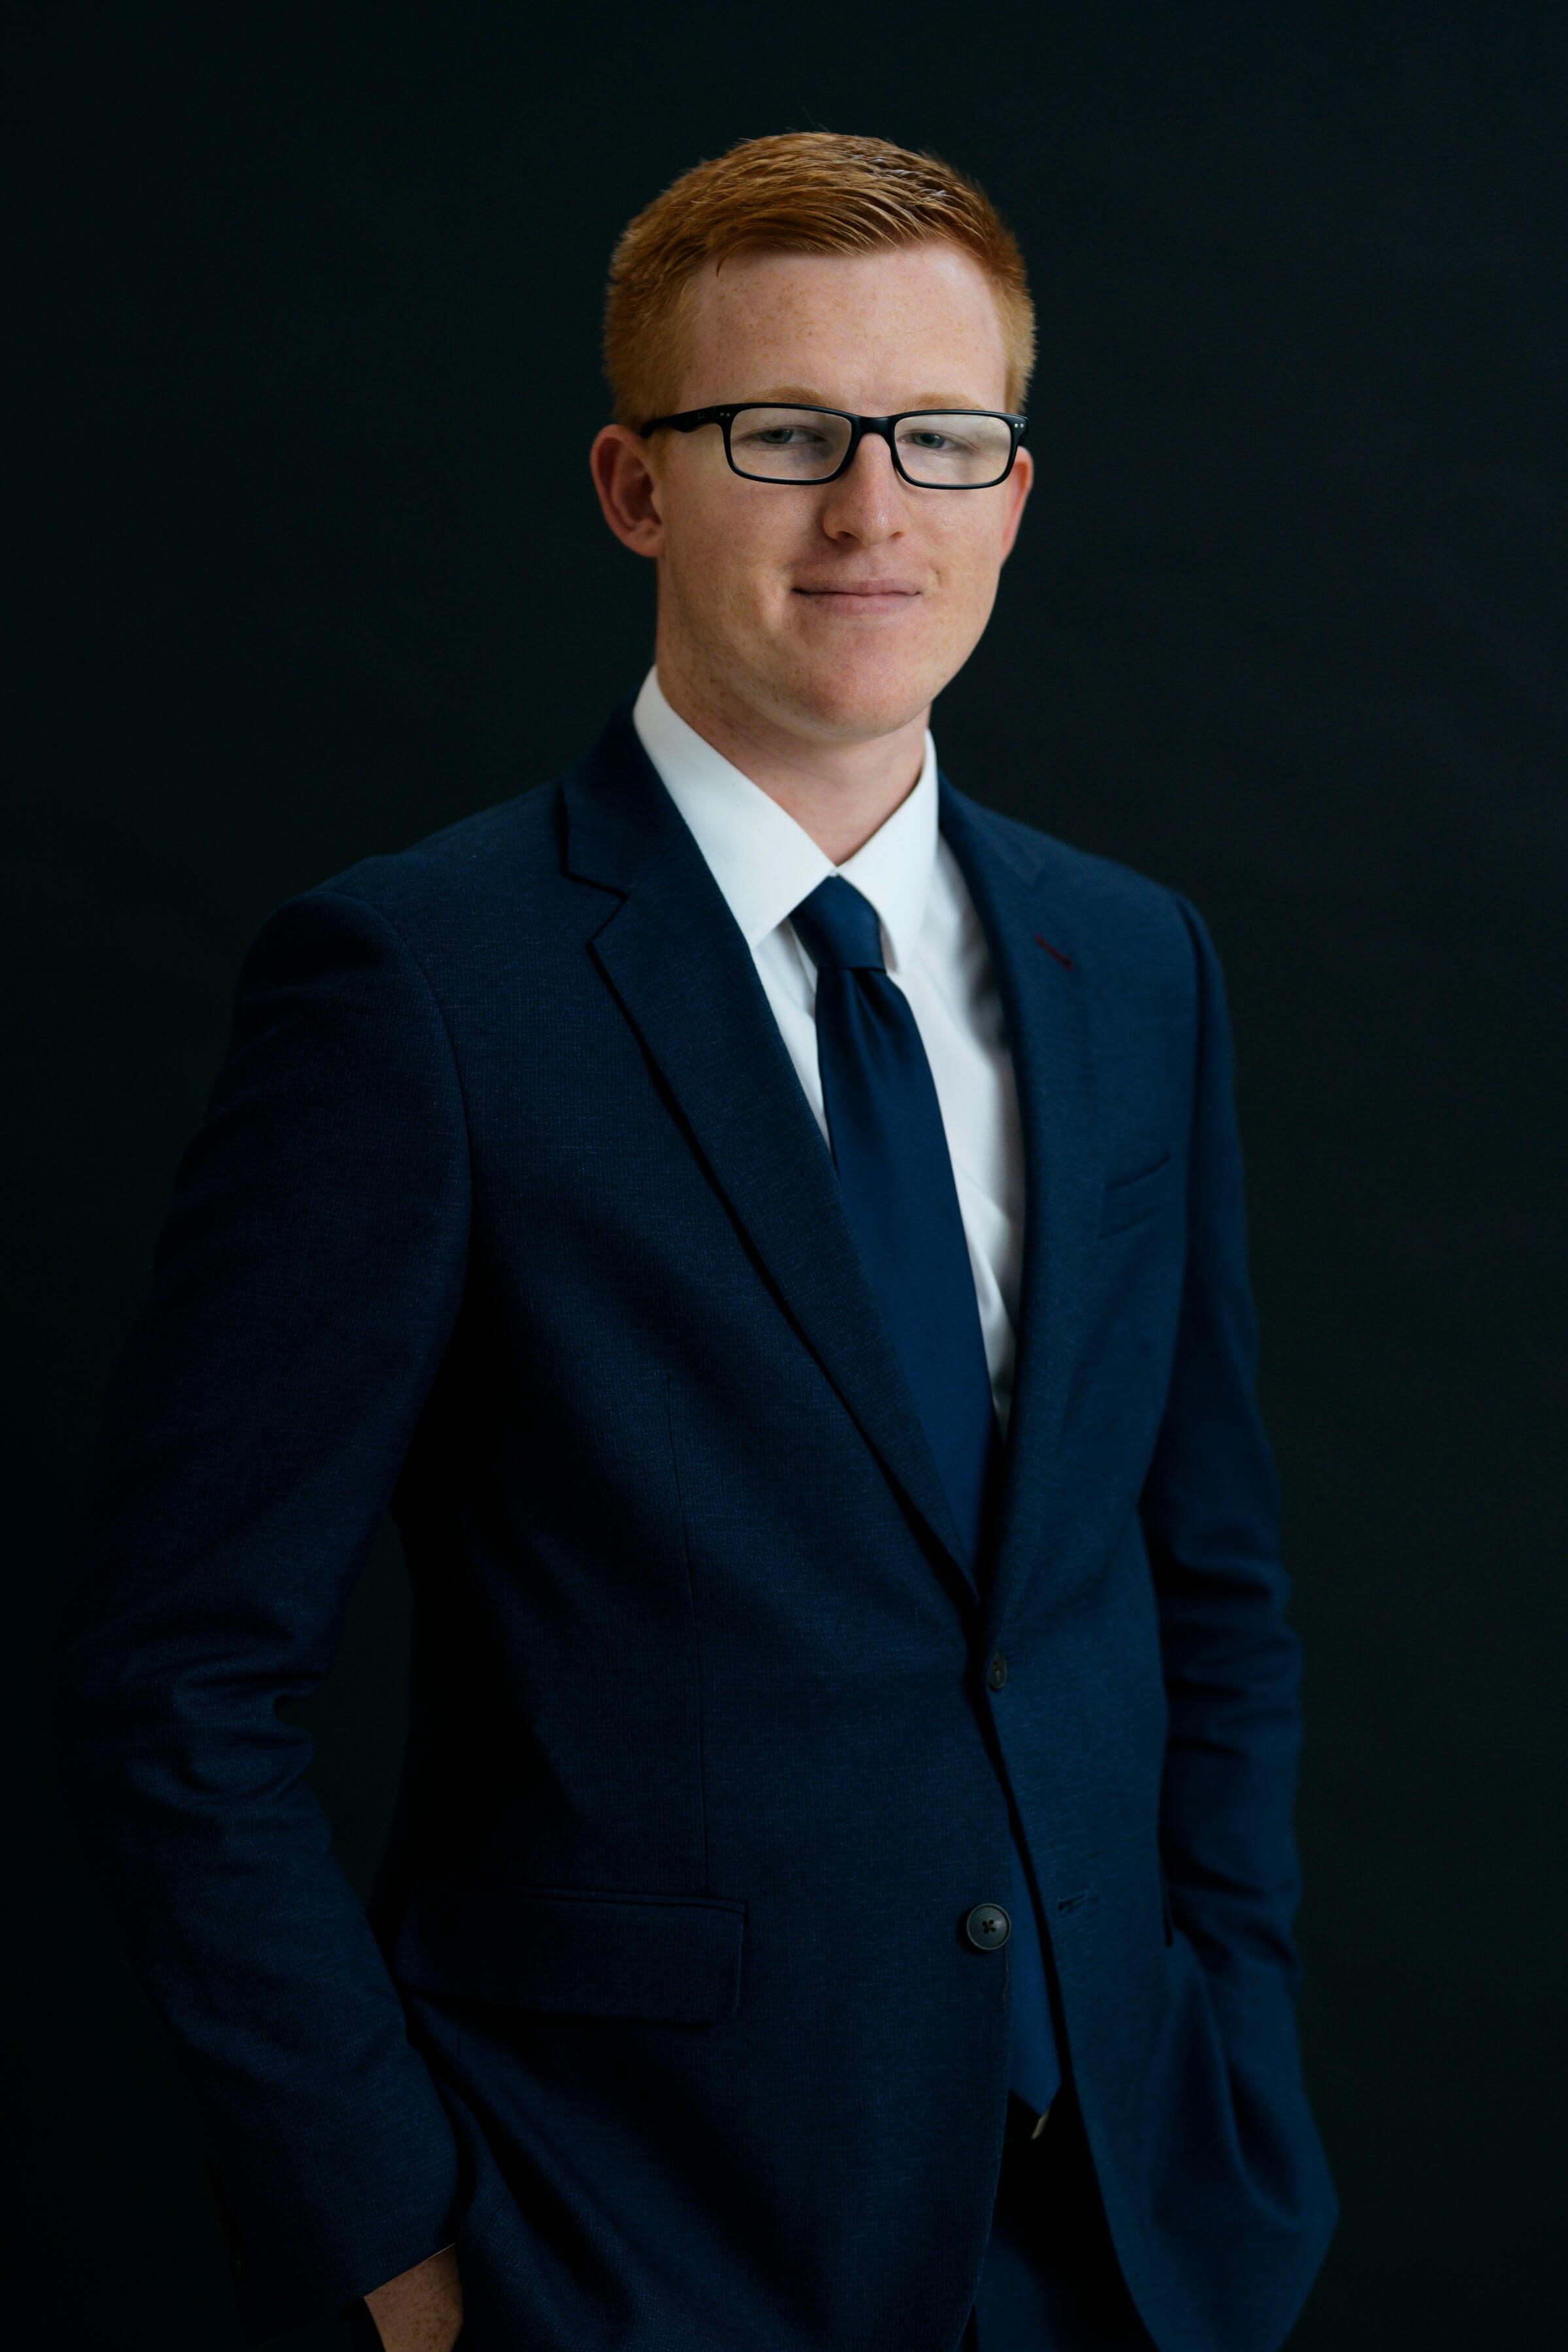 Introducing Tom Hirst